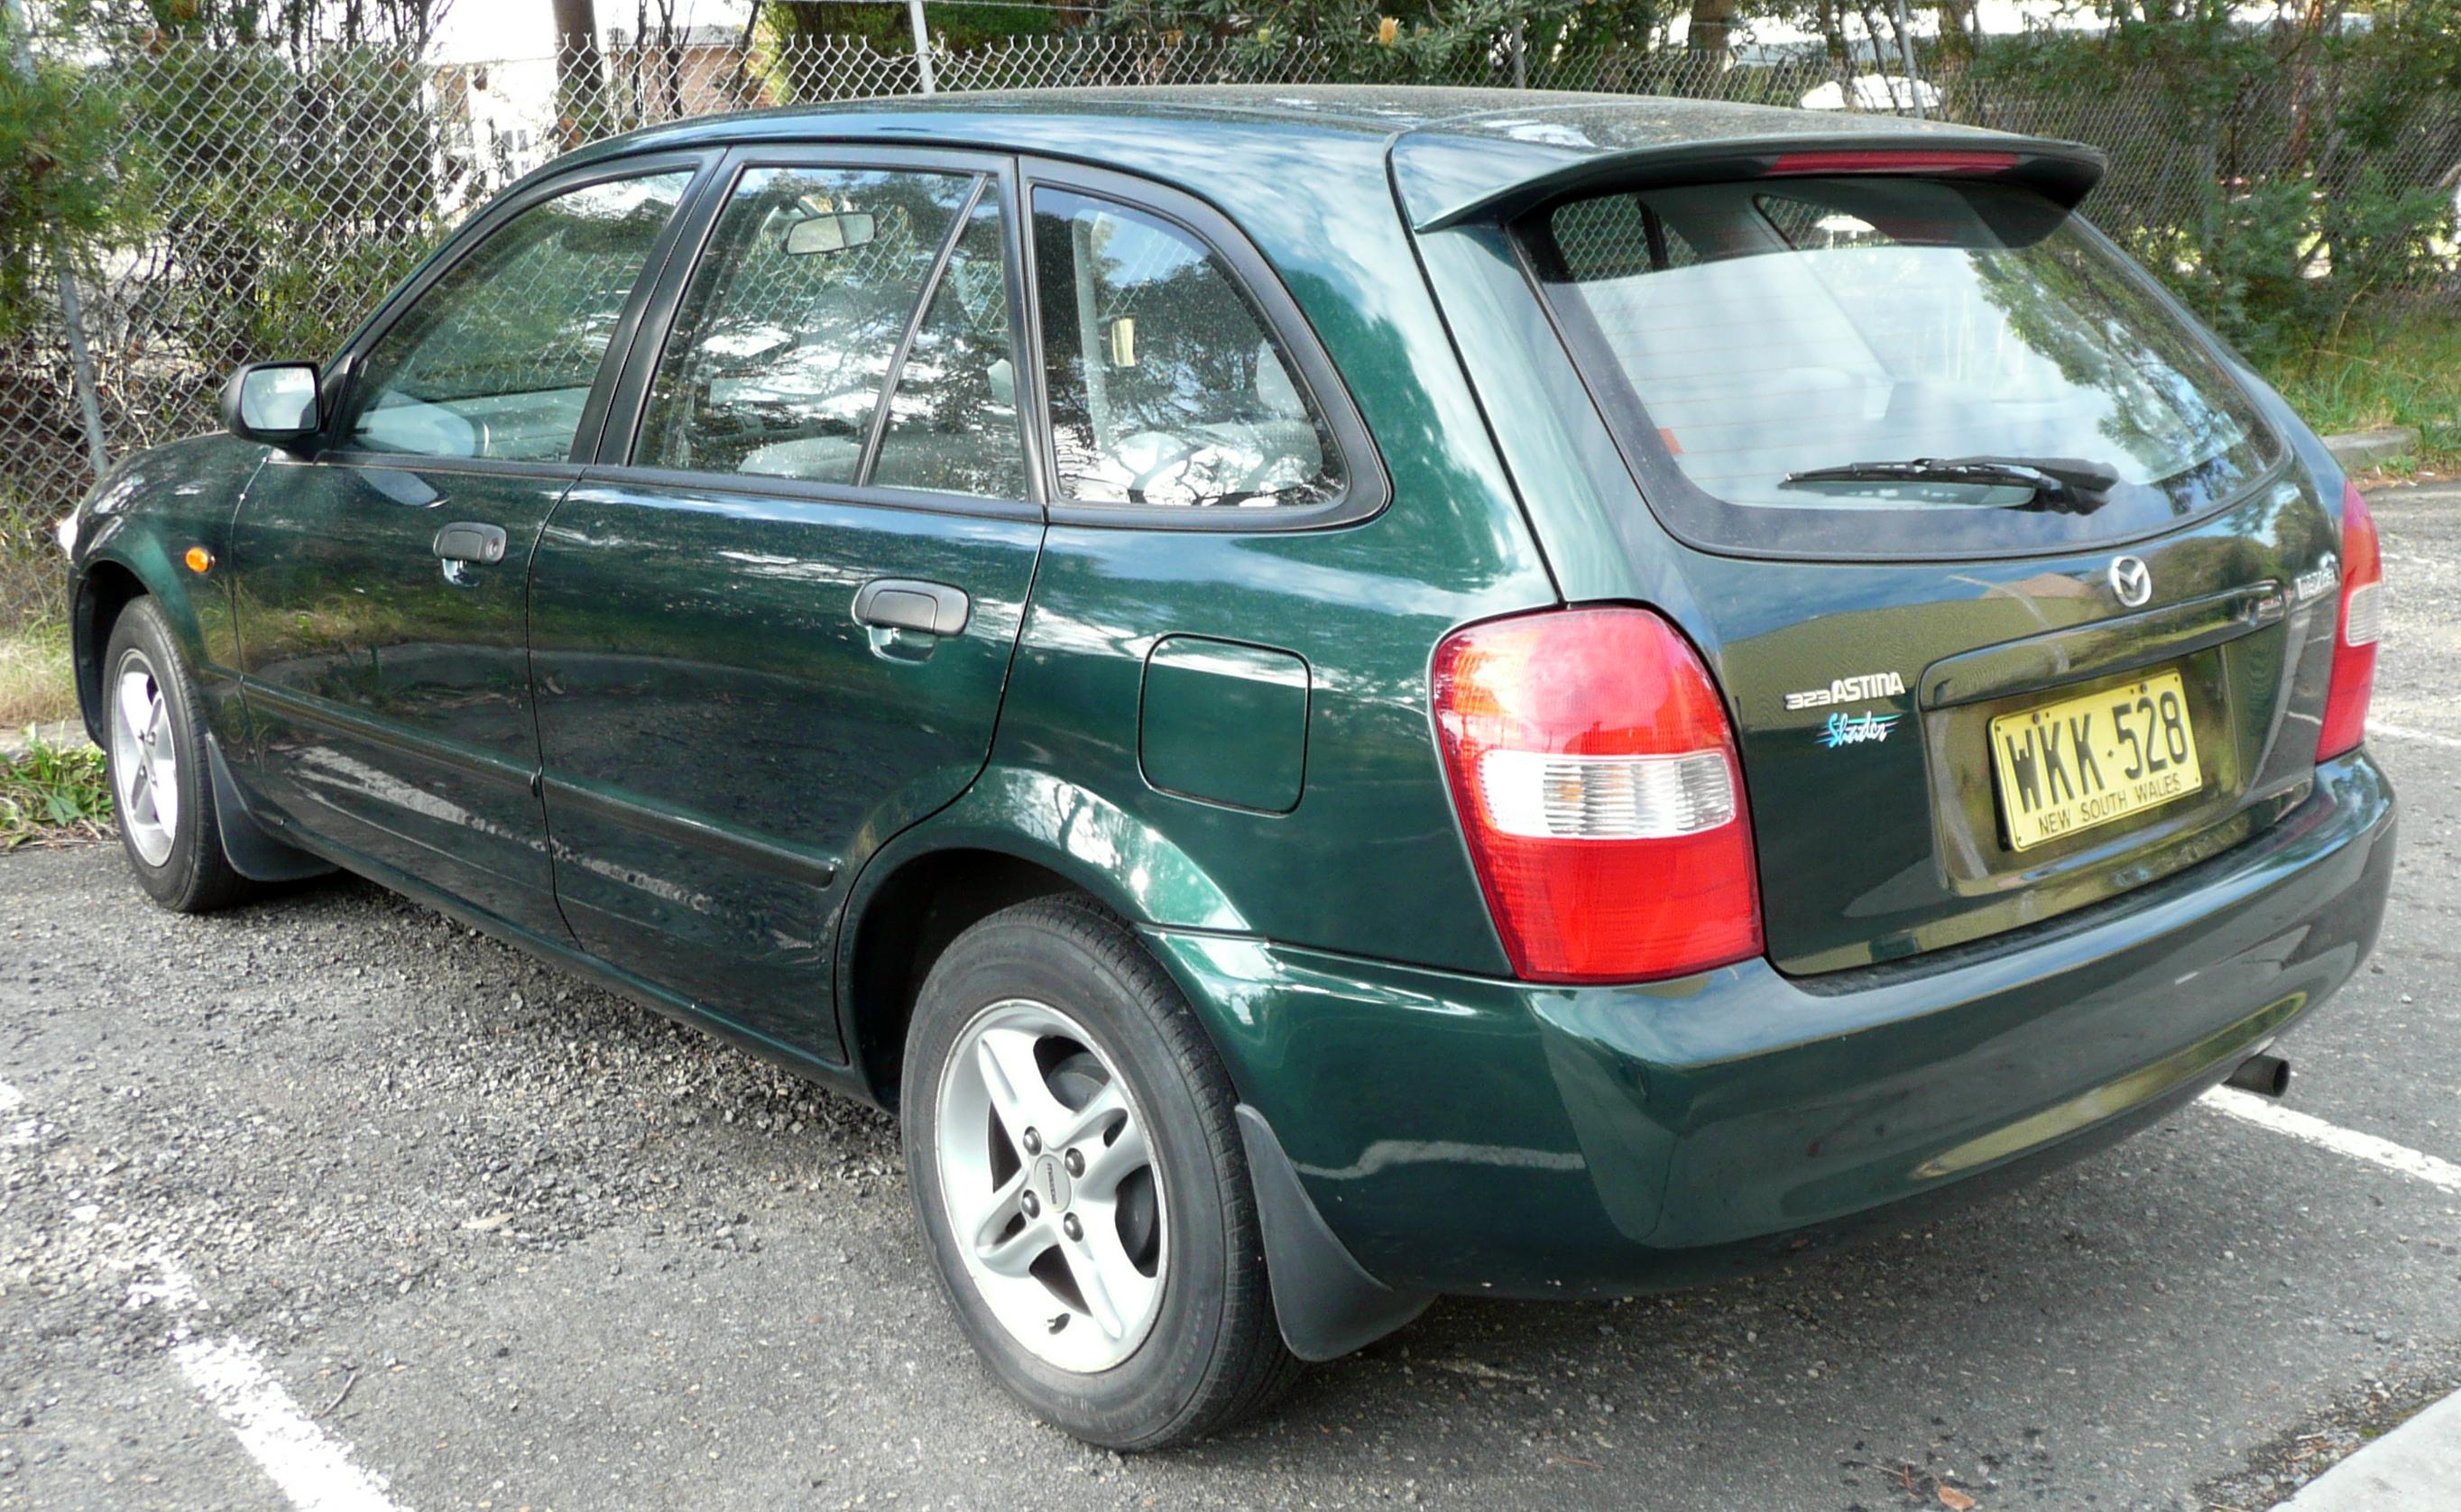 File:1999-2000 Mazda 323 (BJ) Shades Astina 5-door hatchback 03.jpg